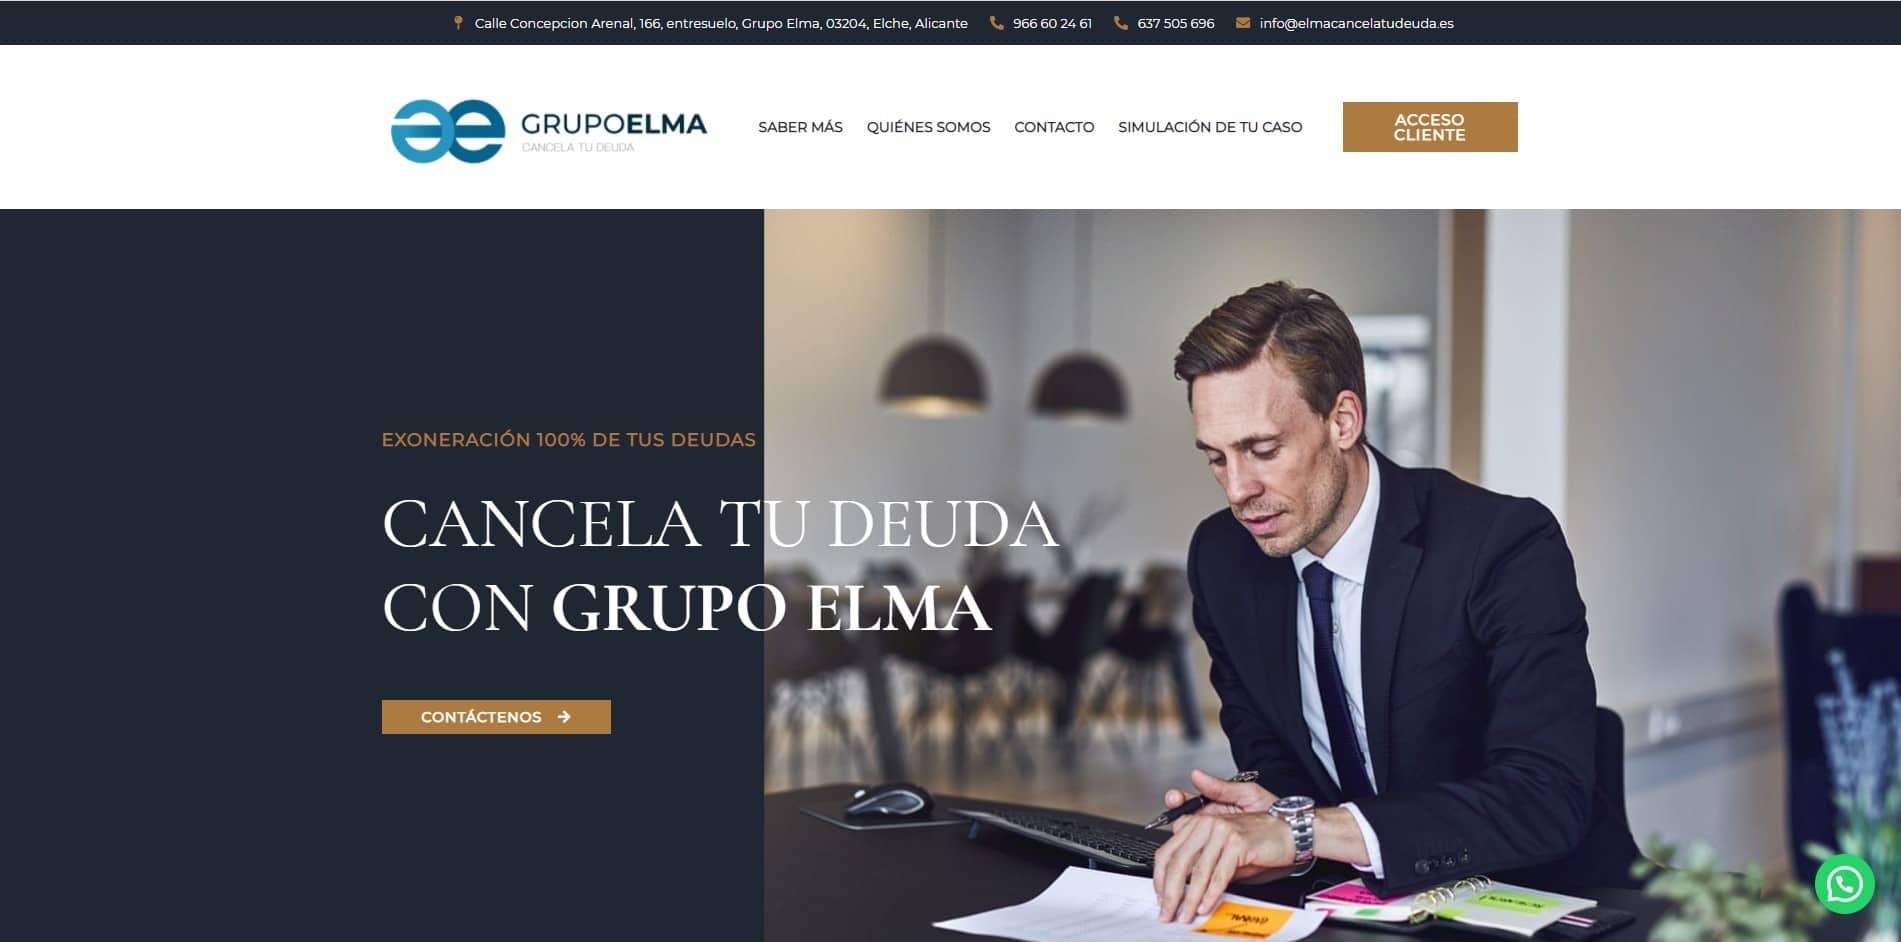 Diseño Web en WordPress Elma Cancela tu Deuda